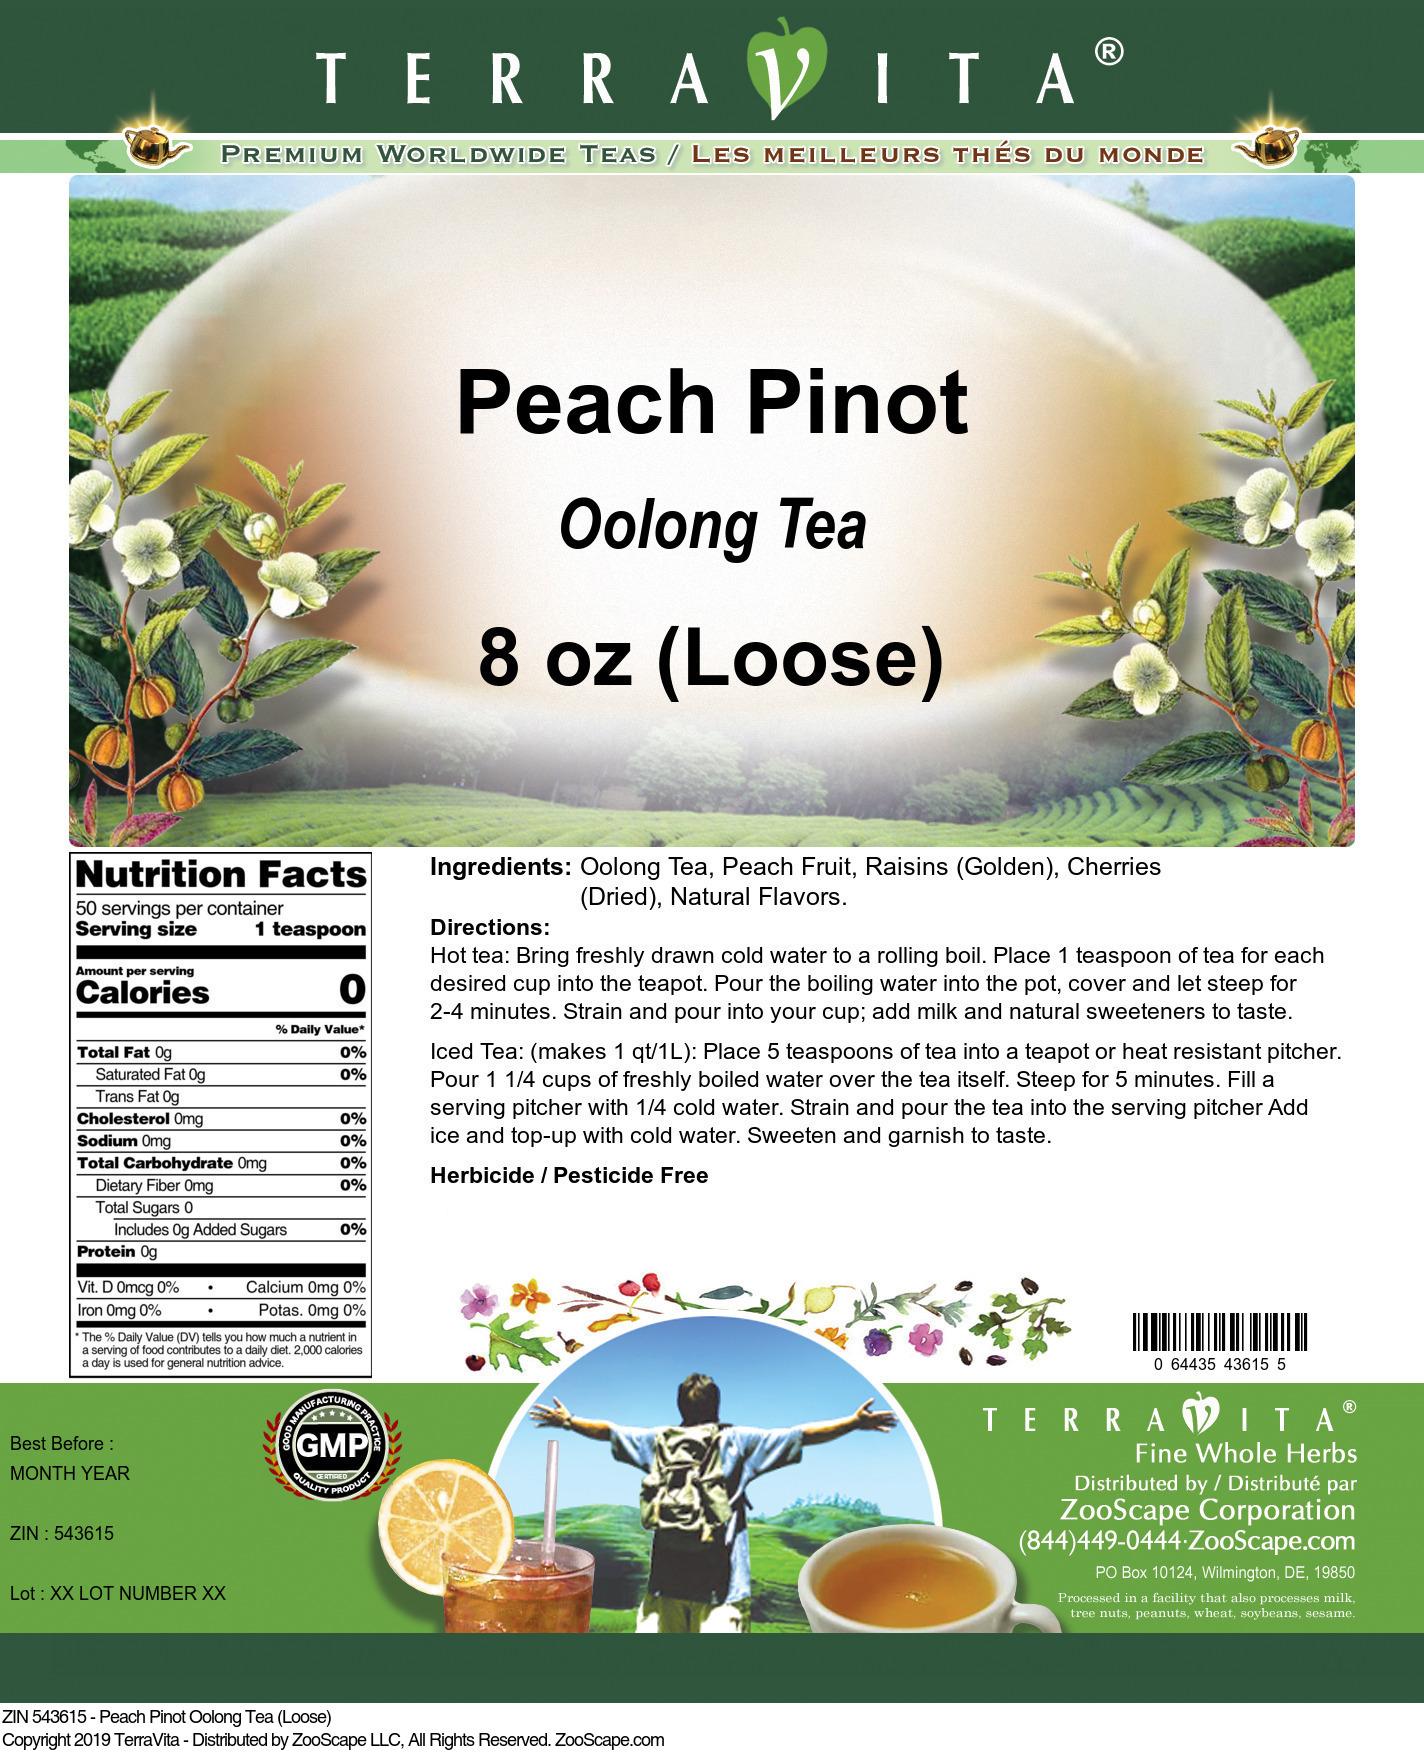 Peach Pinot Oolong Tea